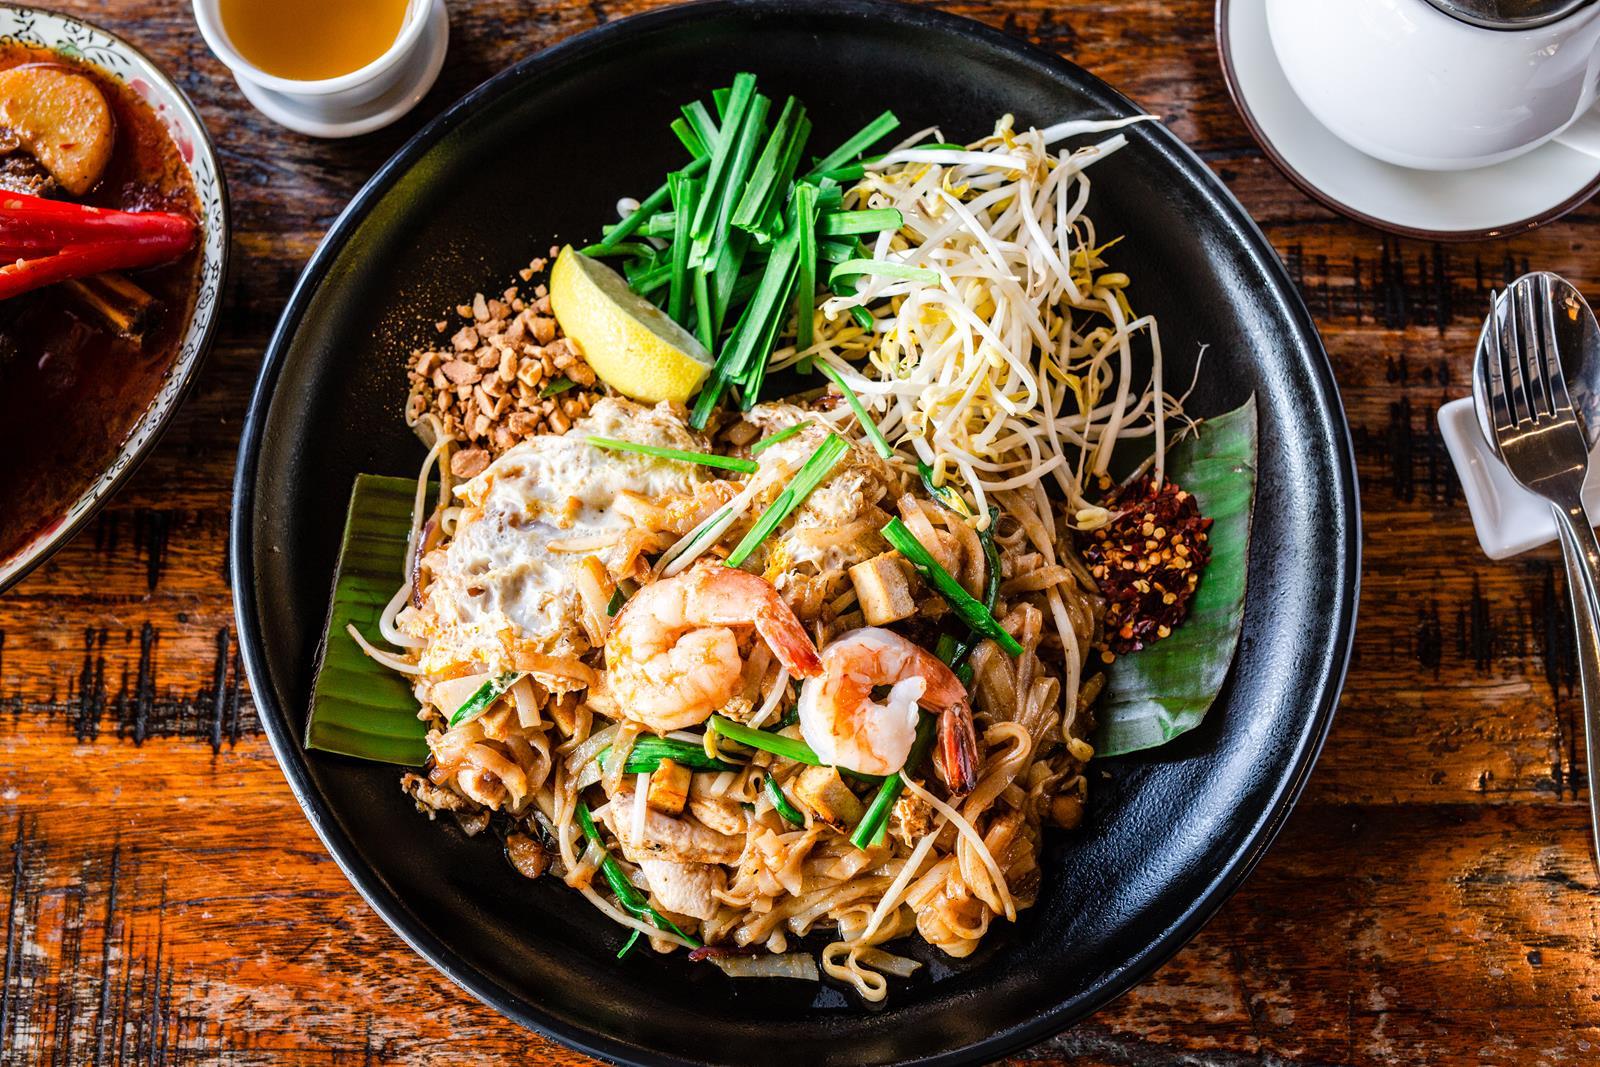 Gemelli - Pad Thai